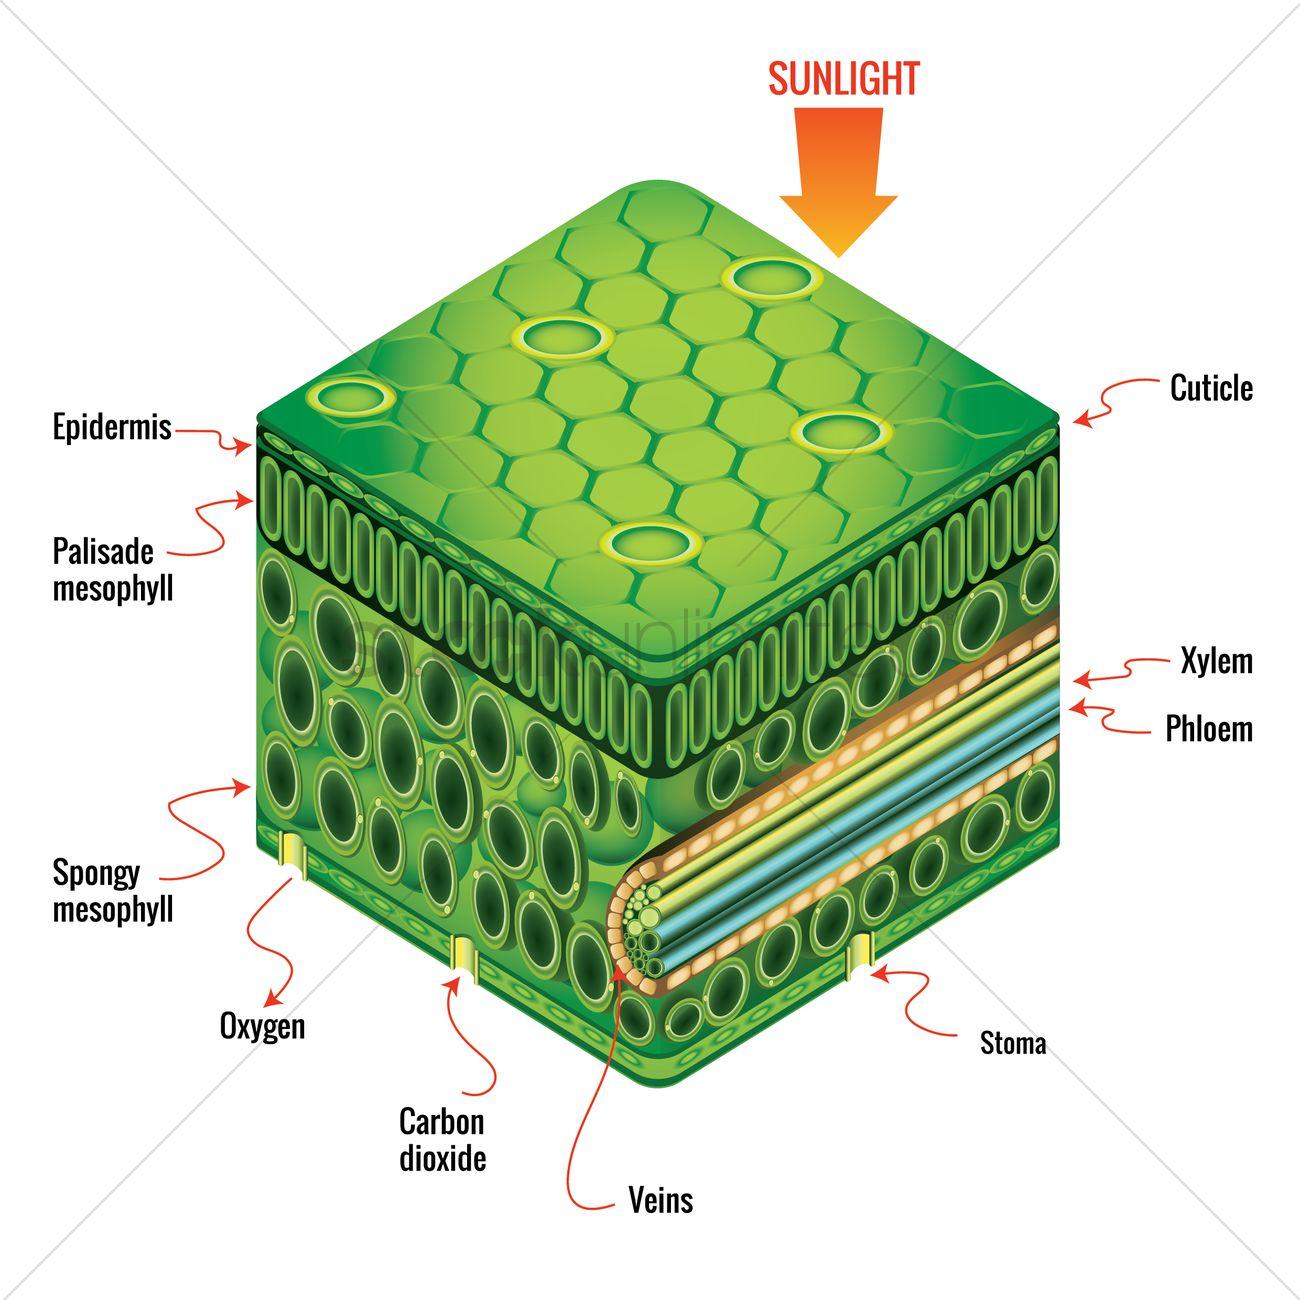 palisade cell diagram plant 1000 watt inverter circuit leaf anatomy vector image 1815346 stockunlimited